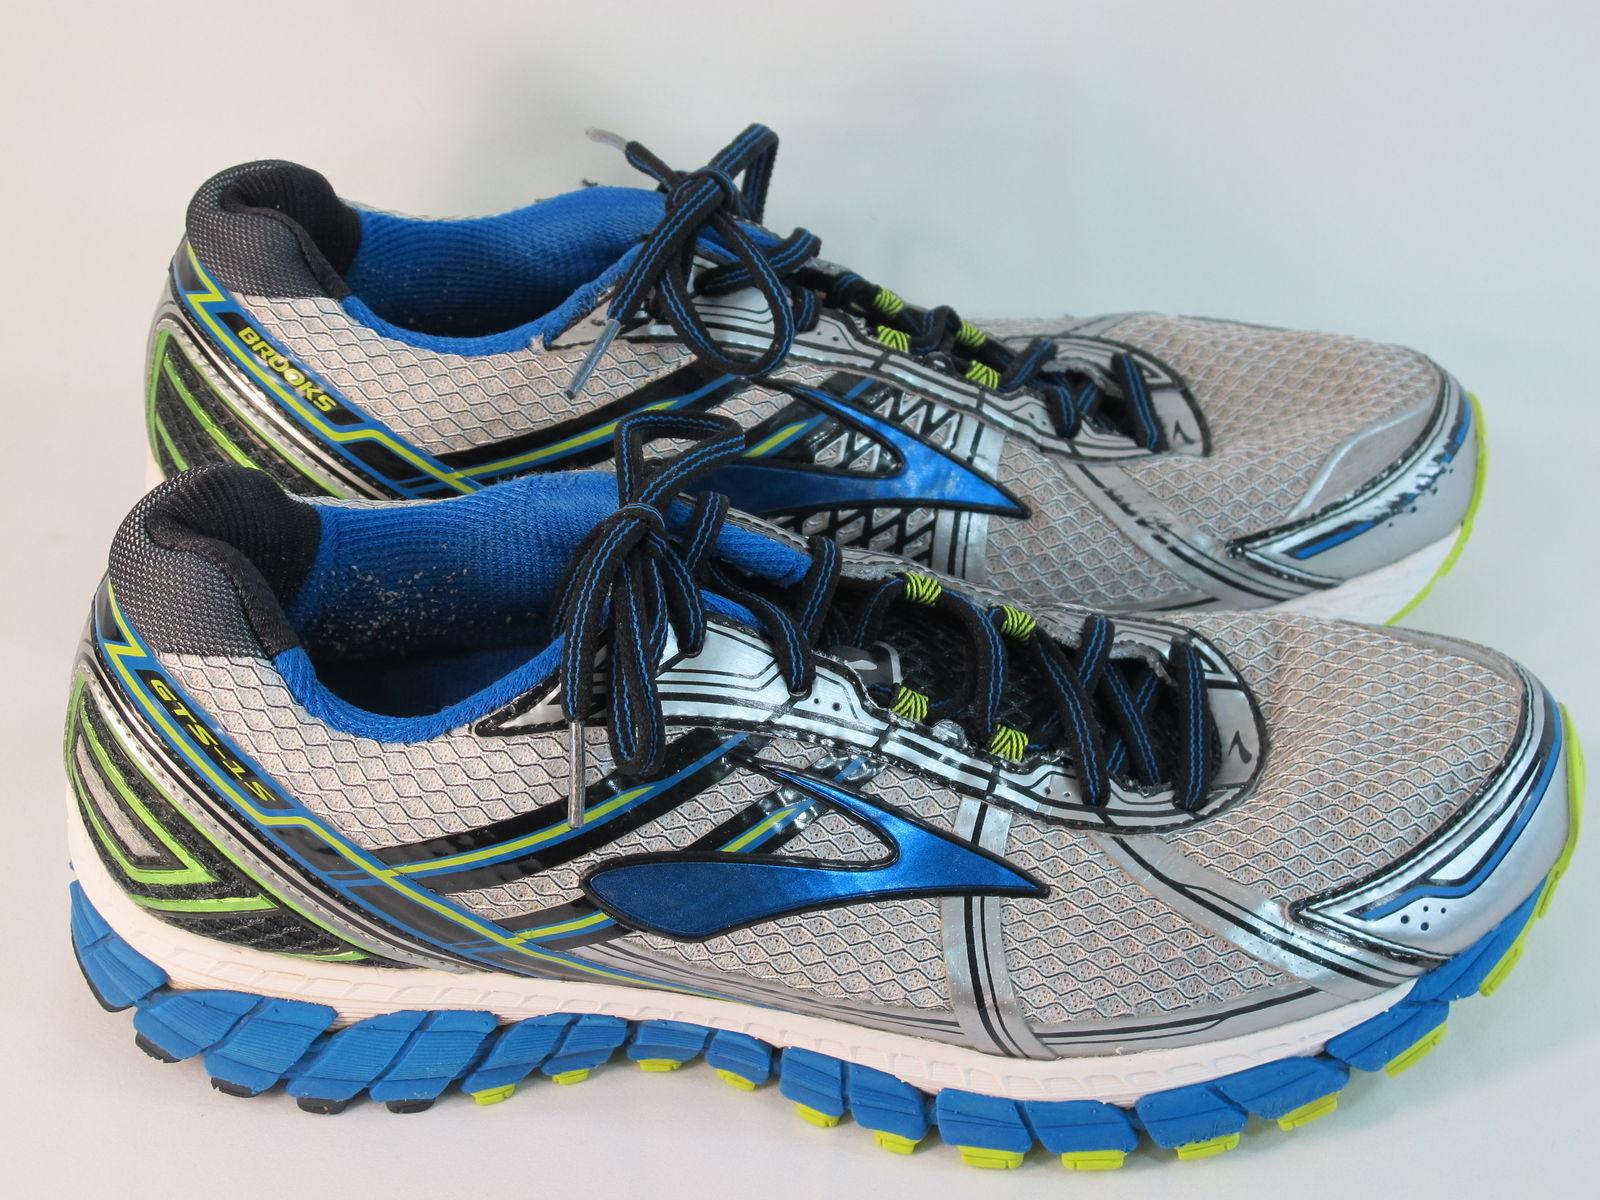 c84ea2927b0e5 Women S Brooks Adrenaline Gts 15 Wide Width Running Shoes - Style ...